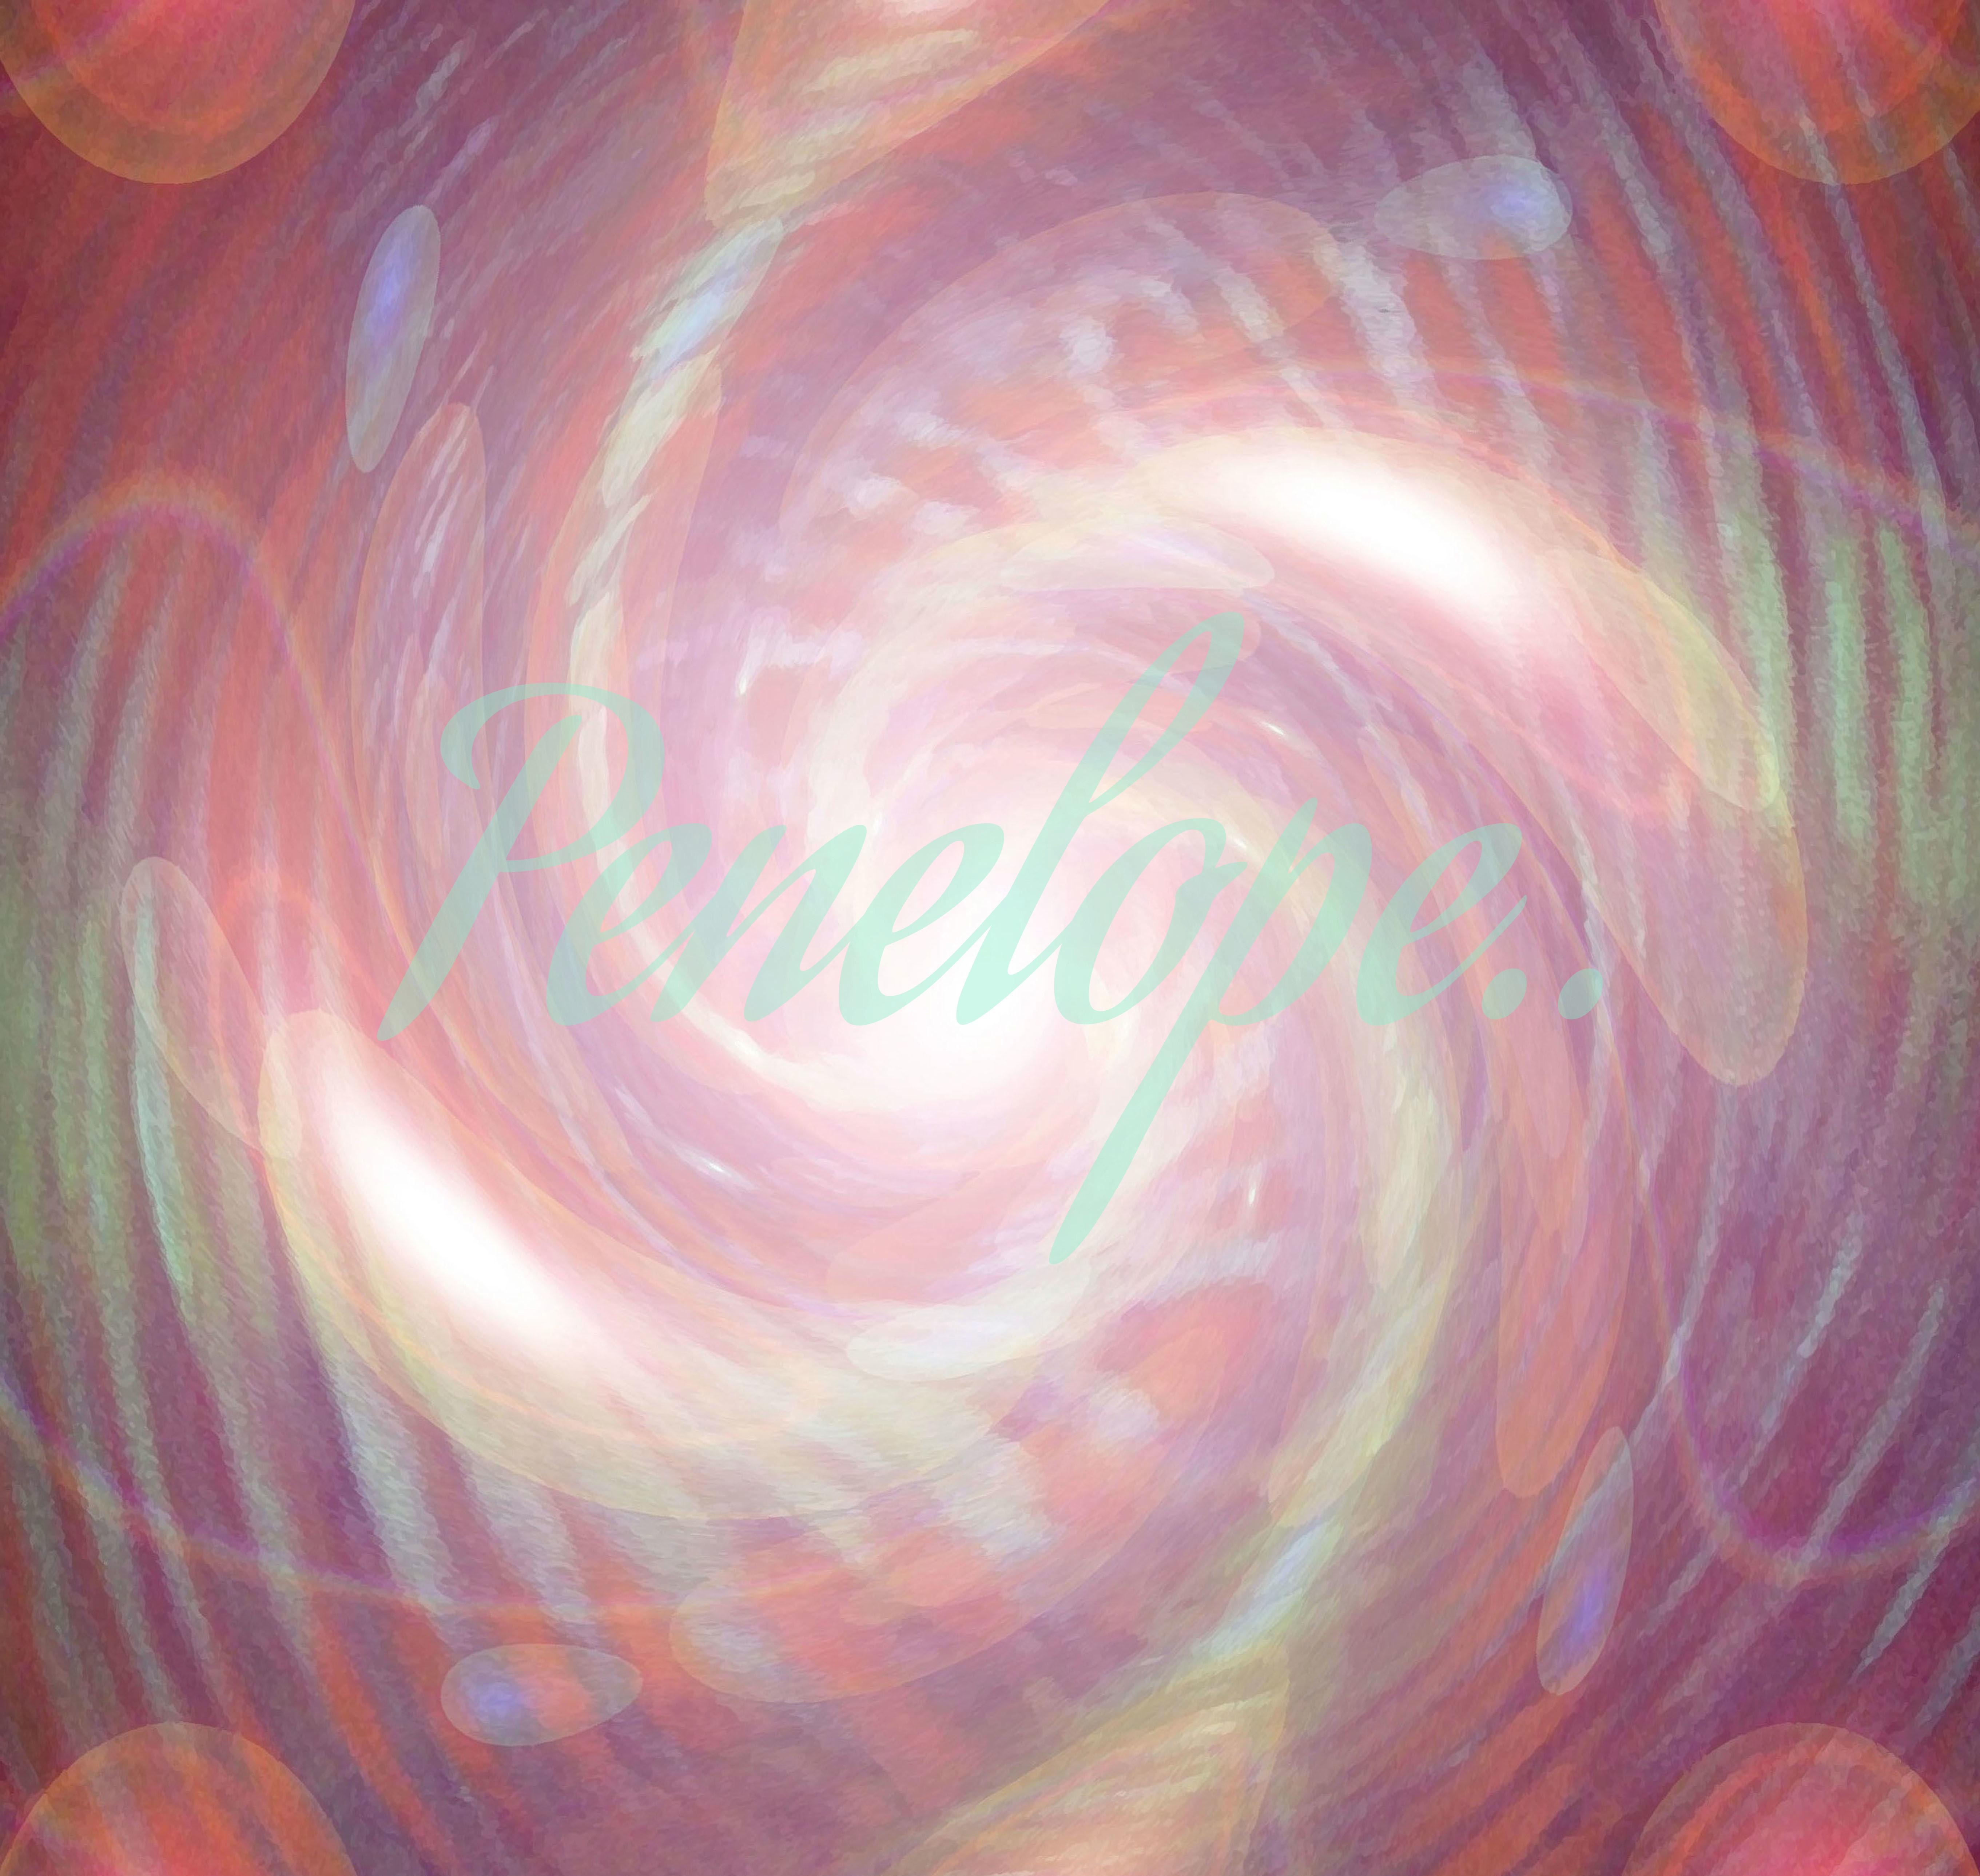 squared twirl vortex meg.jpg